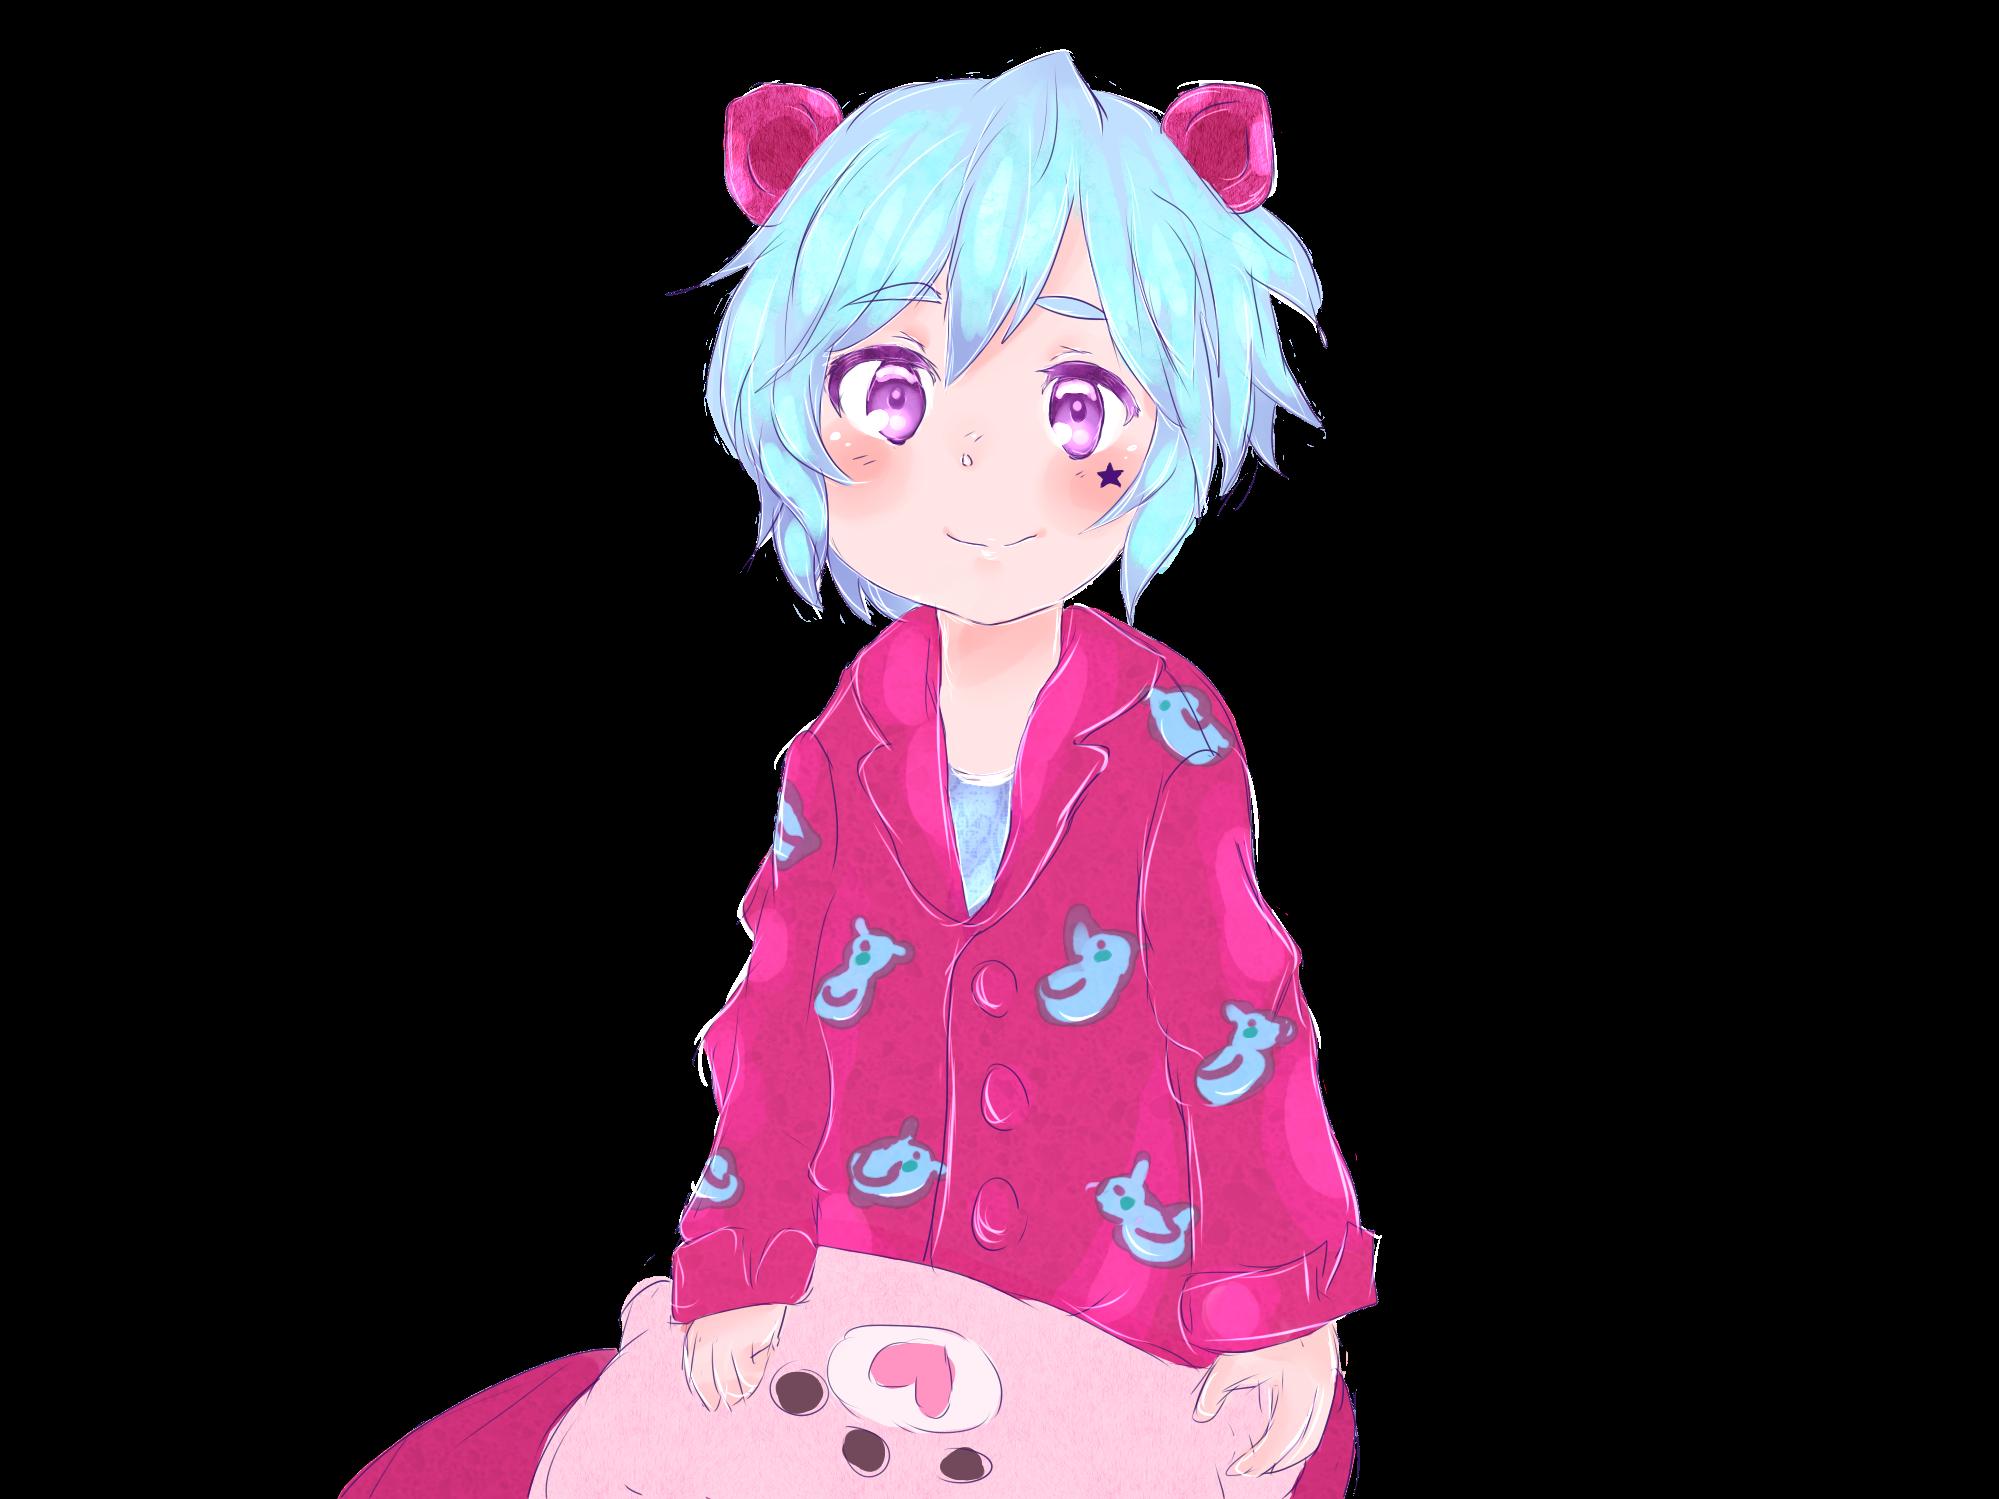 kakuzen____commission____by_little_x_flower-dbgt4iy.png